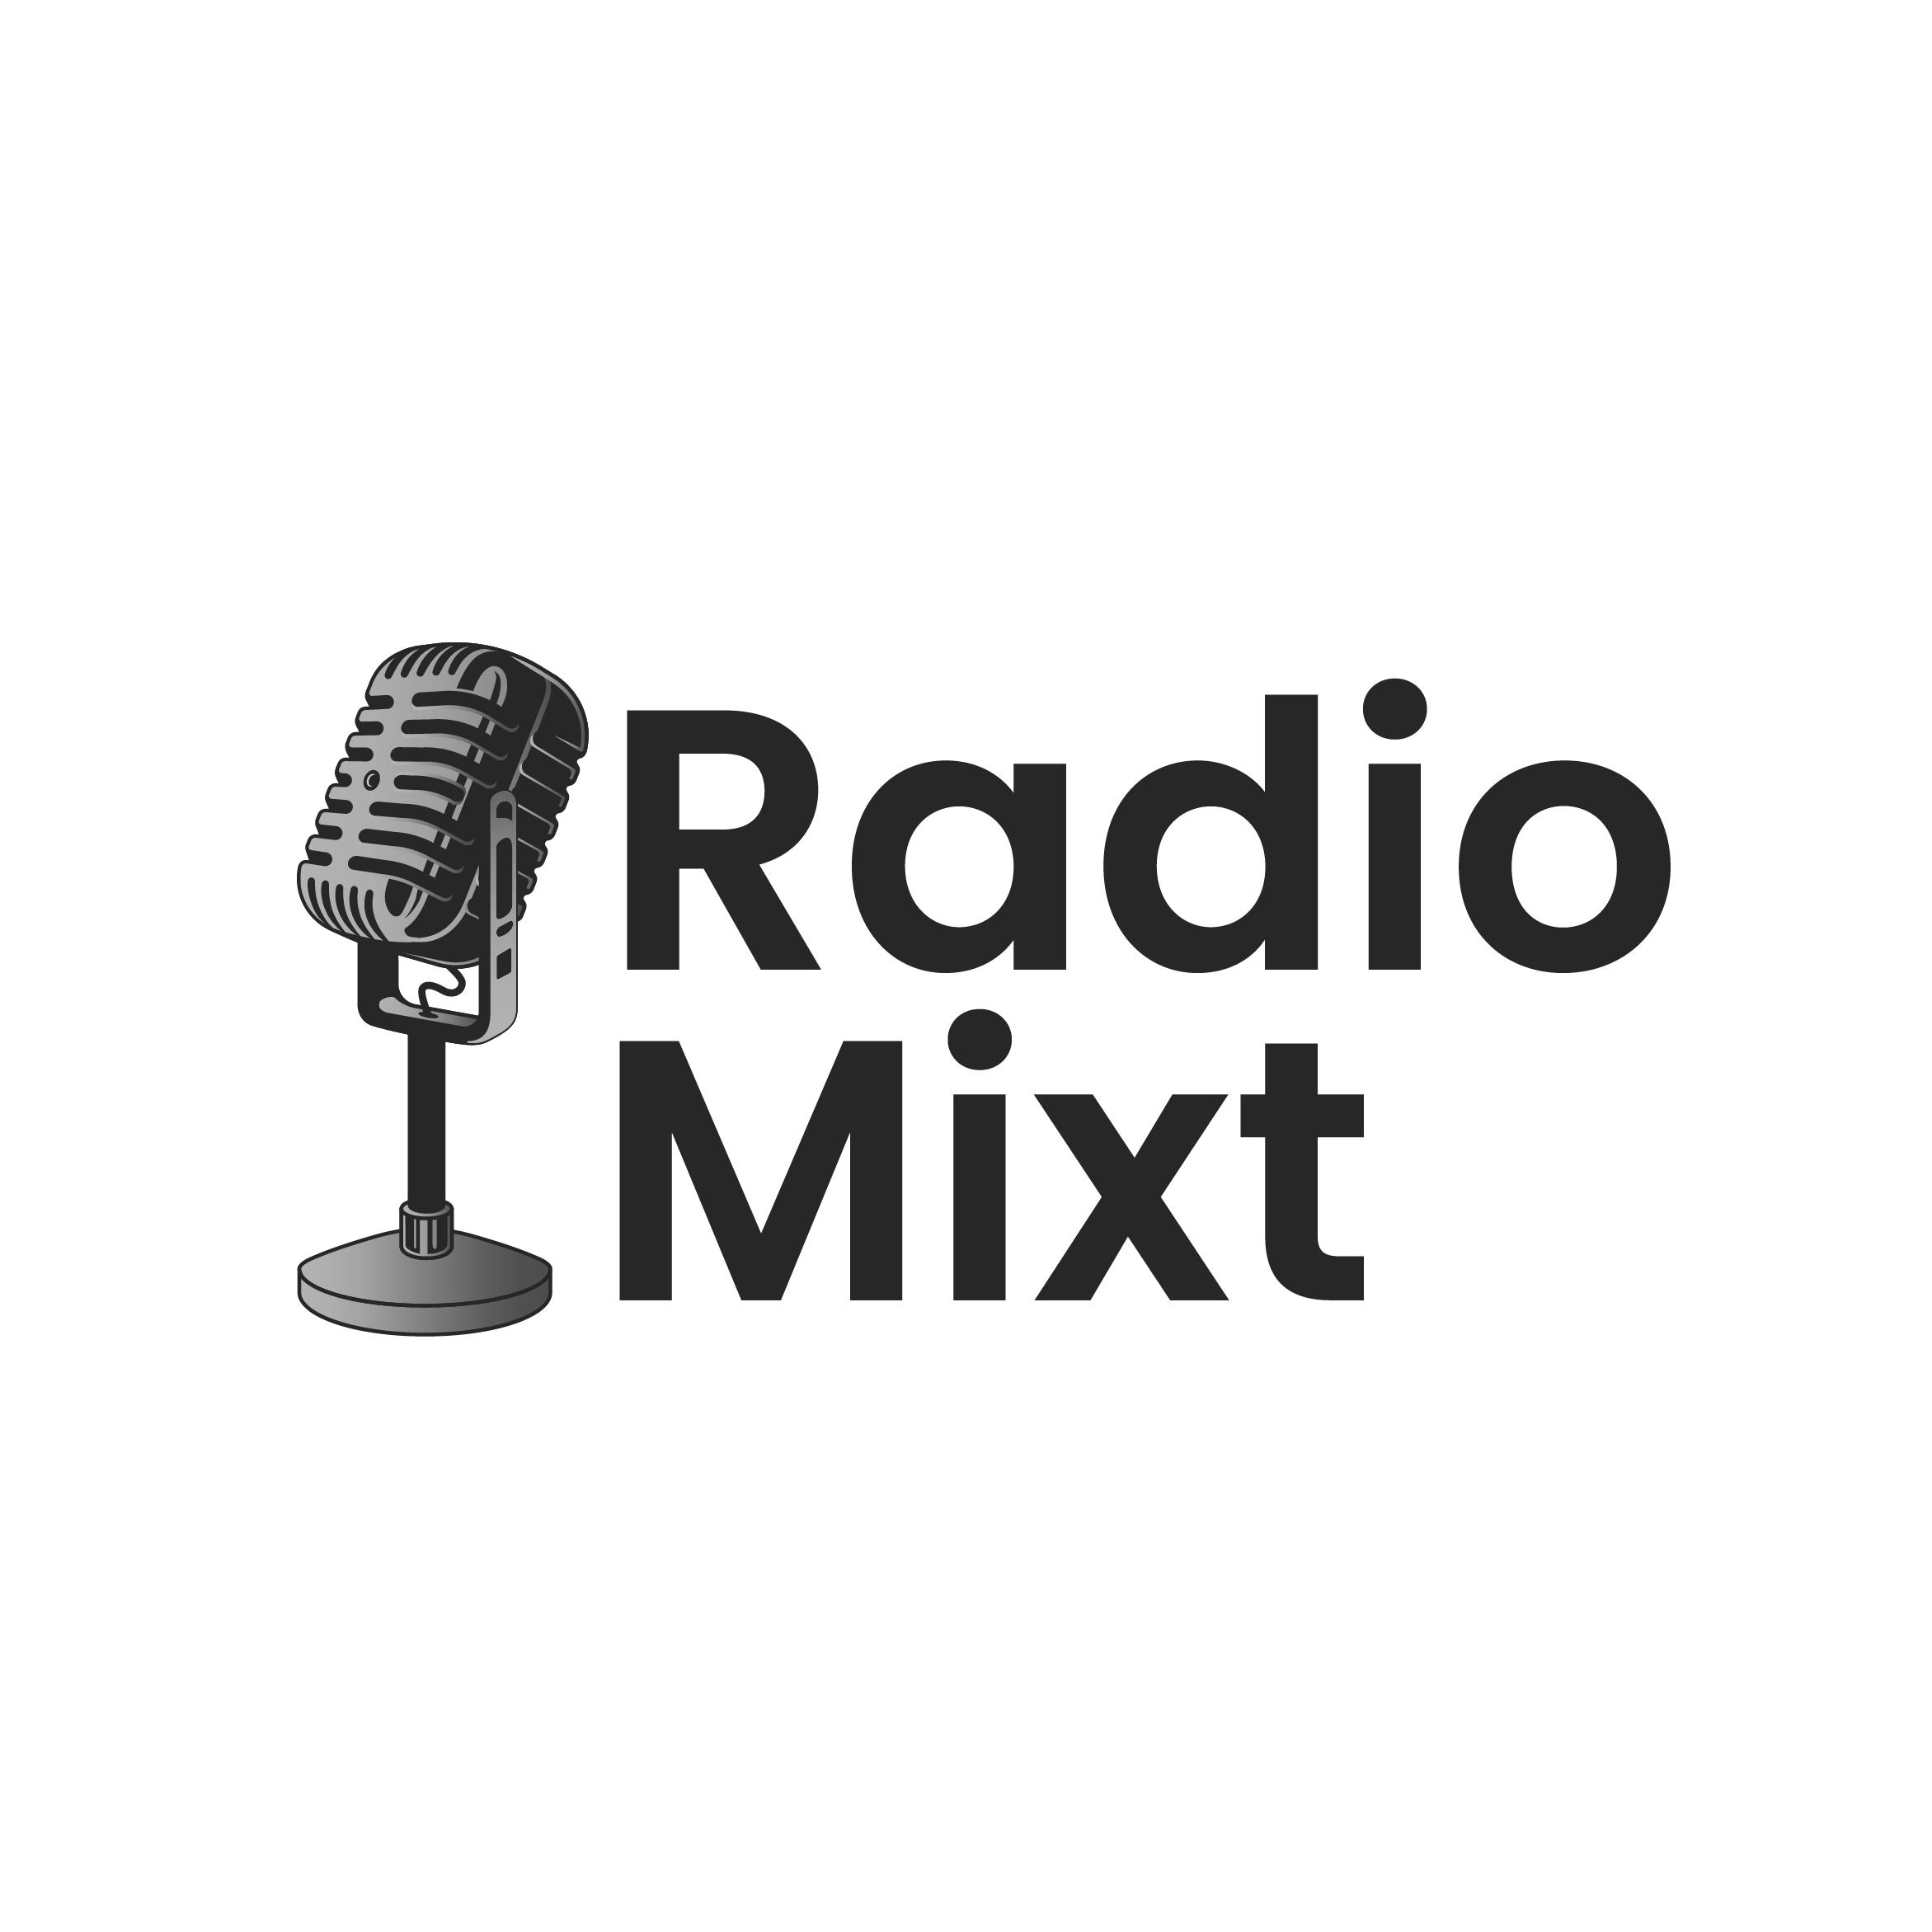 Radio Mixt Manele Romania - www.radiomixt.ro - Hostat by DPHost.ro